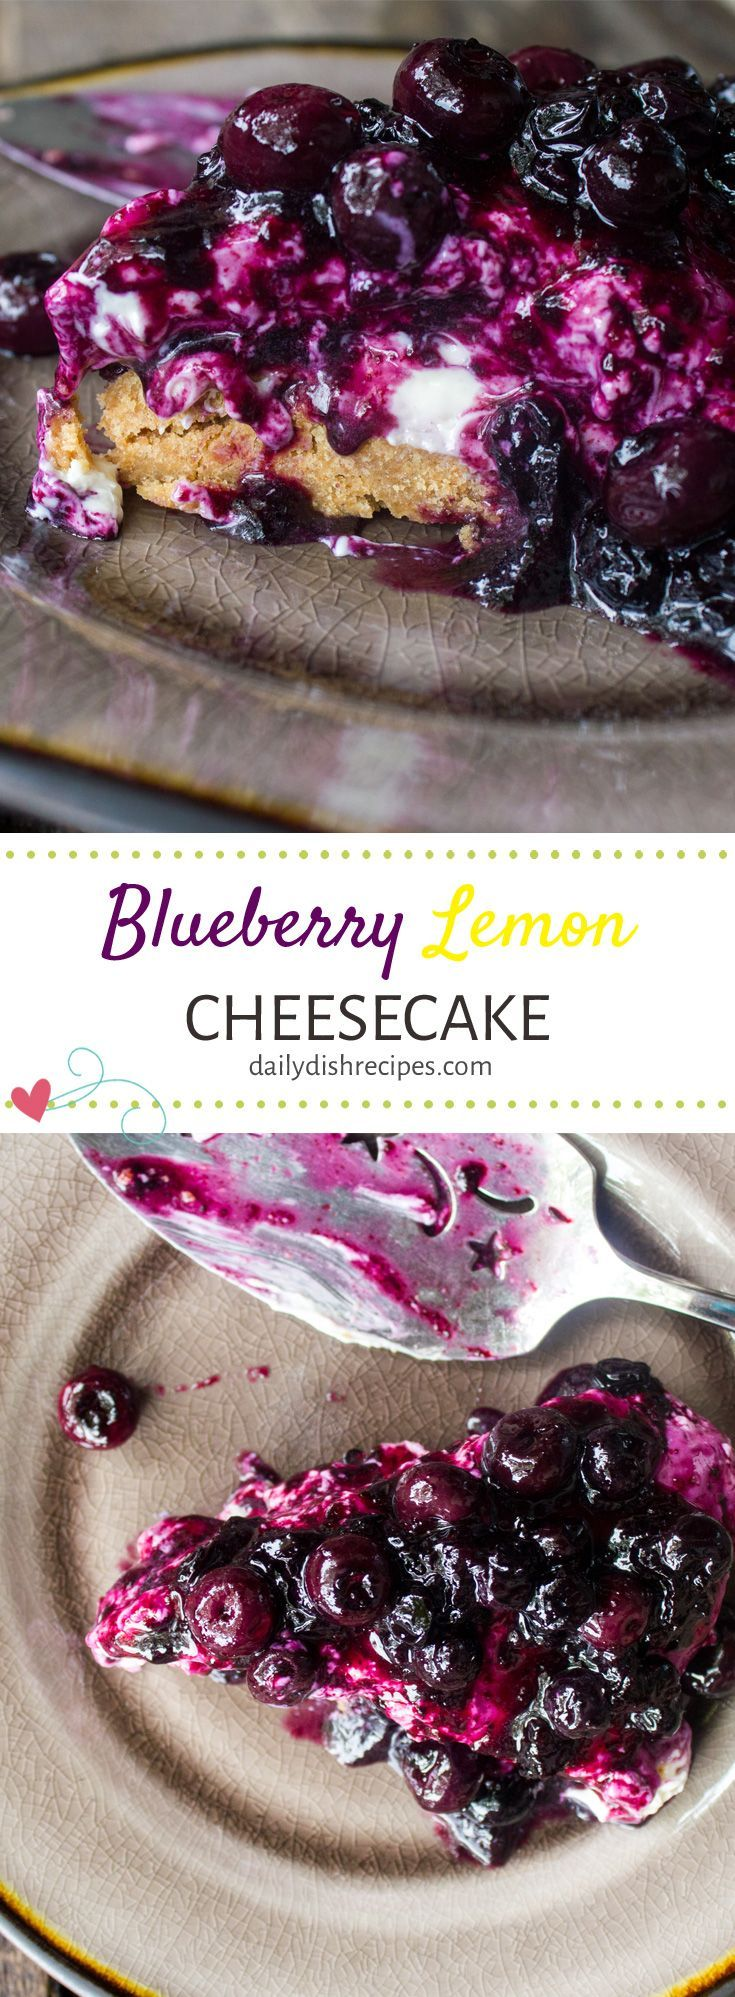 No-Bake Blueberry Lemon Cheesecake #SummerDessertW…